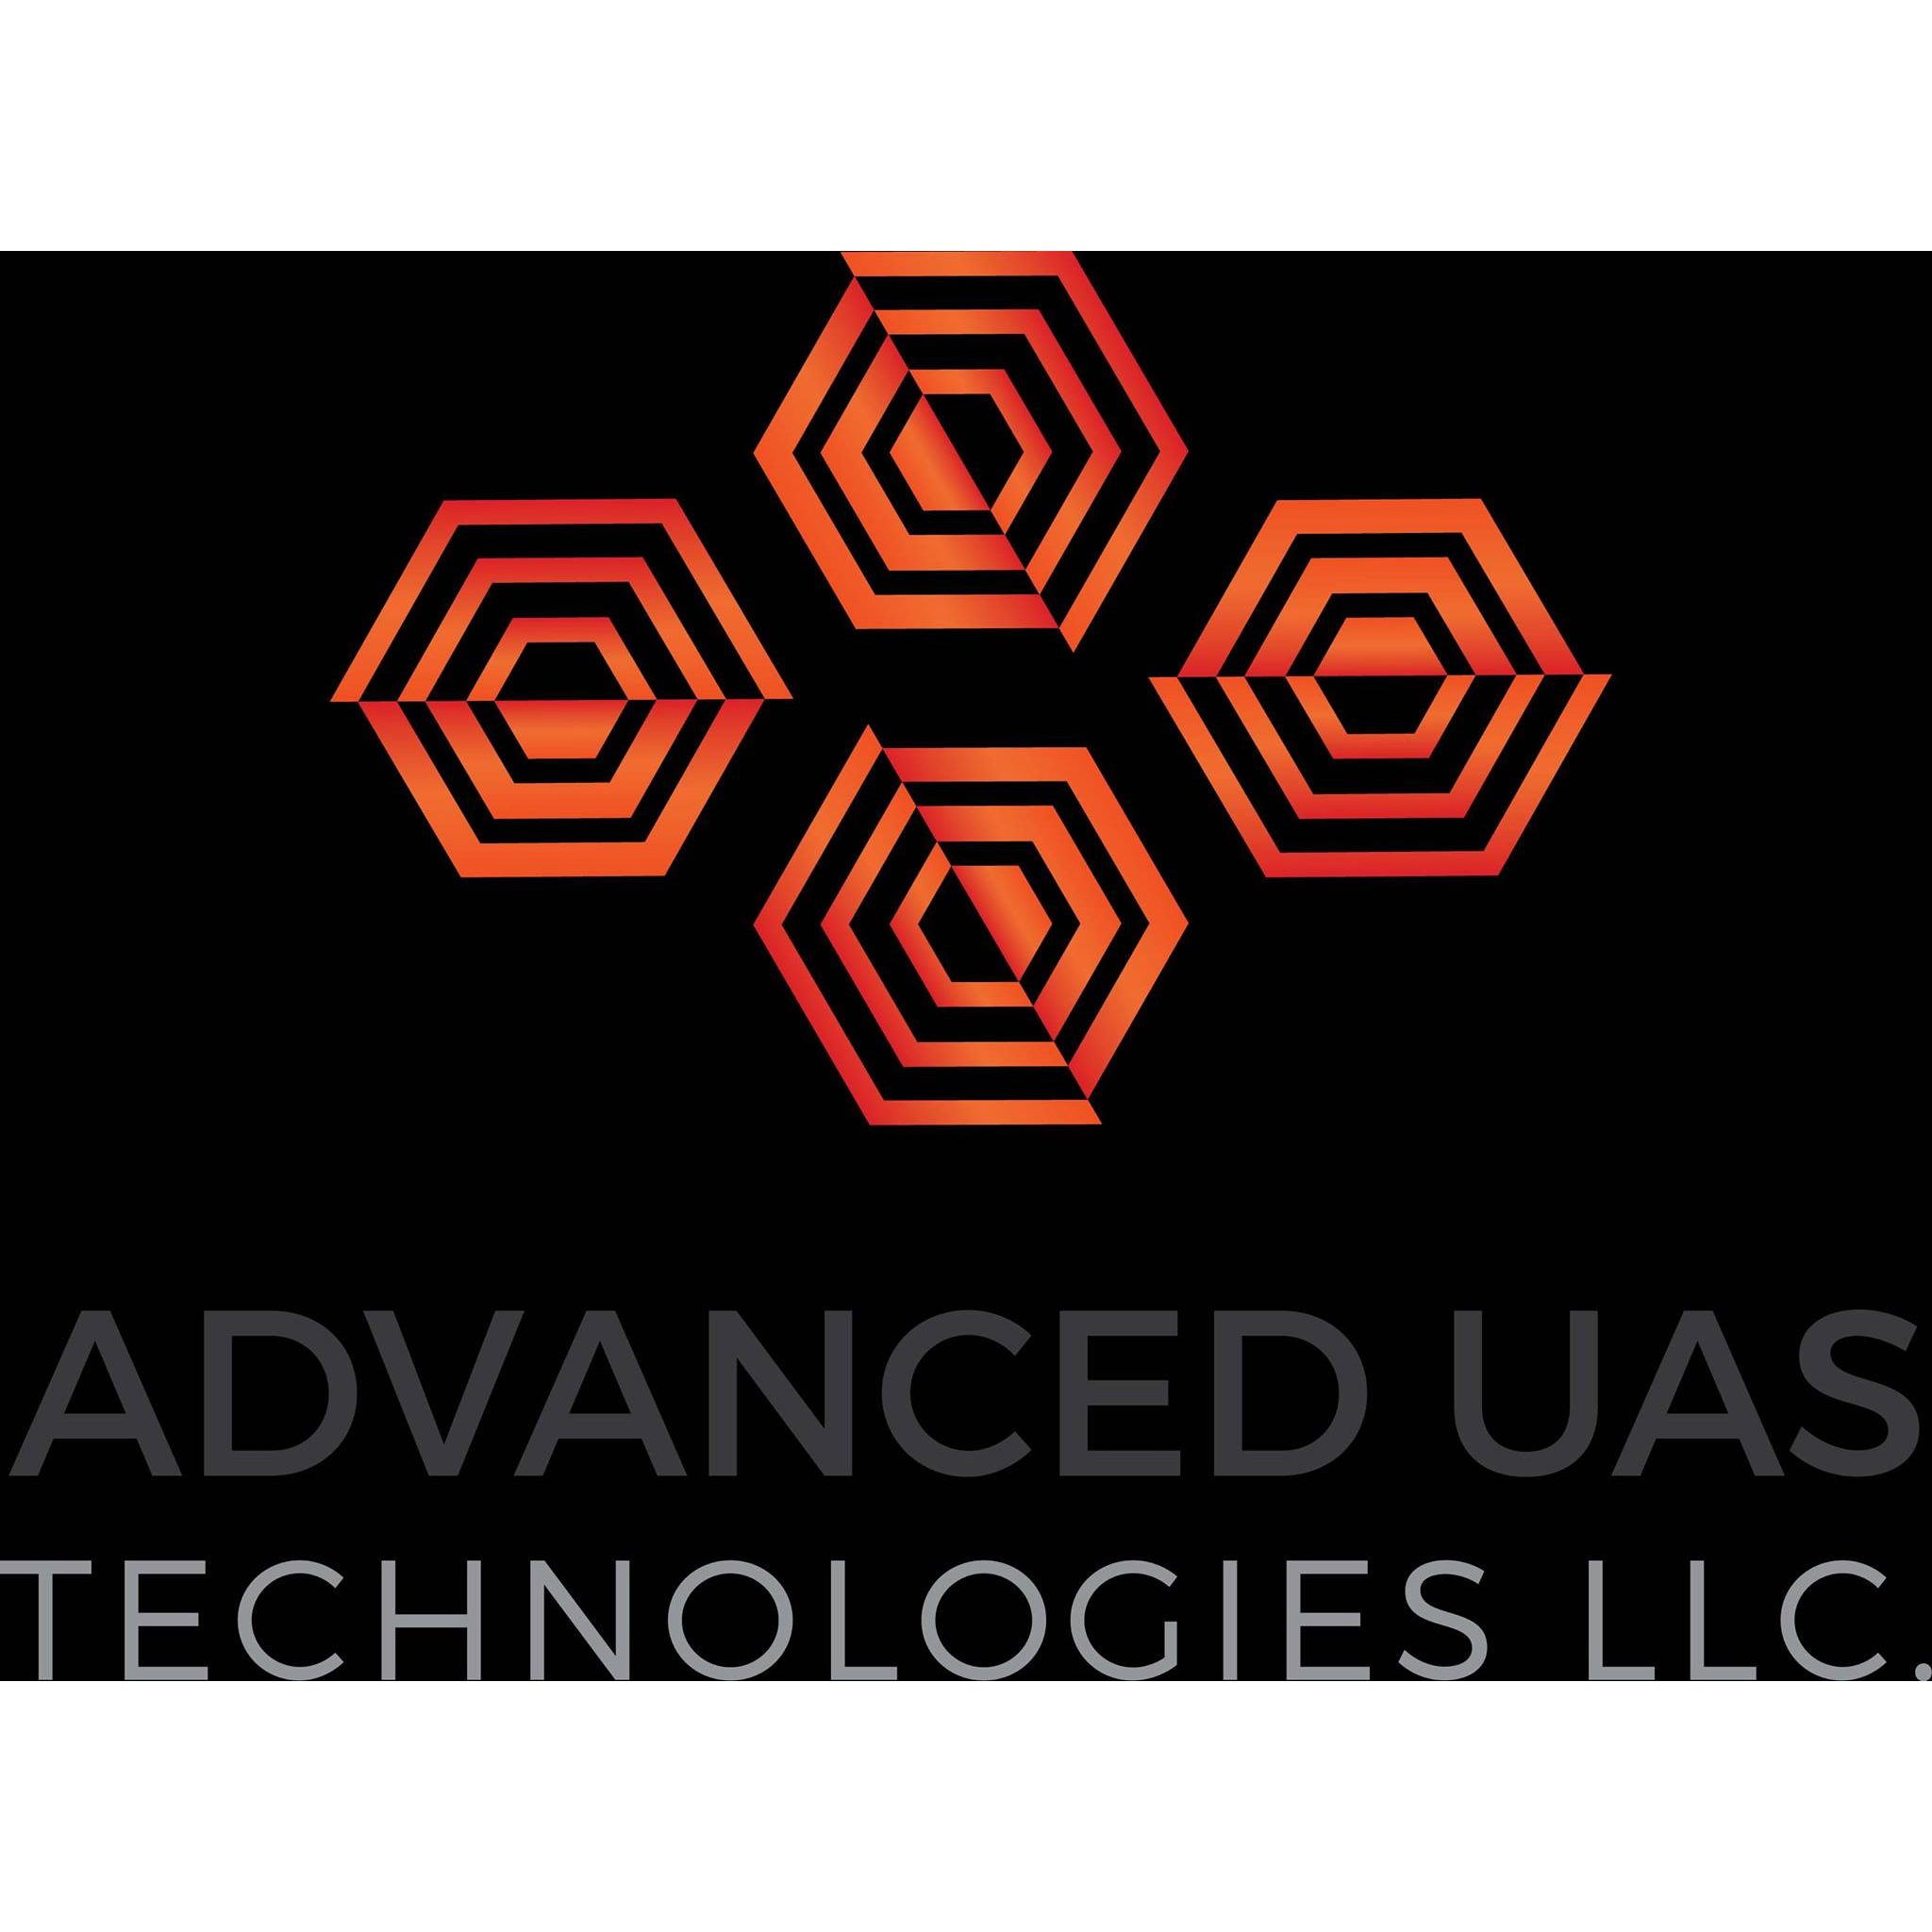 Advanced UAS Technologies, LLC